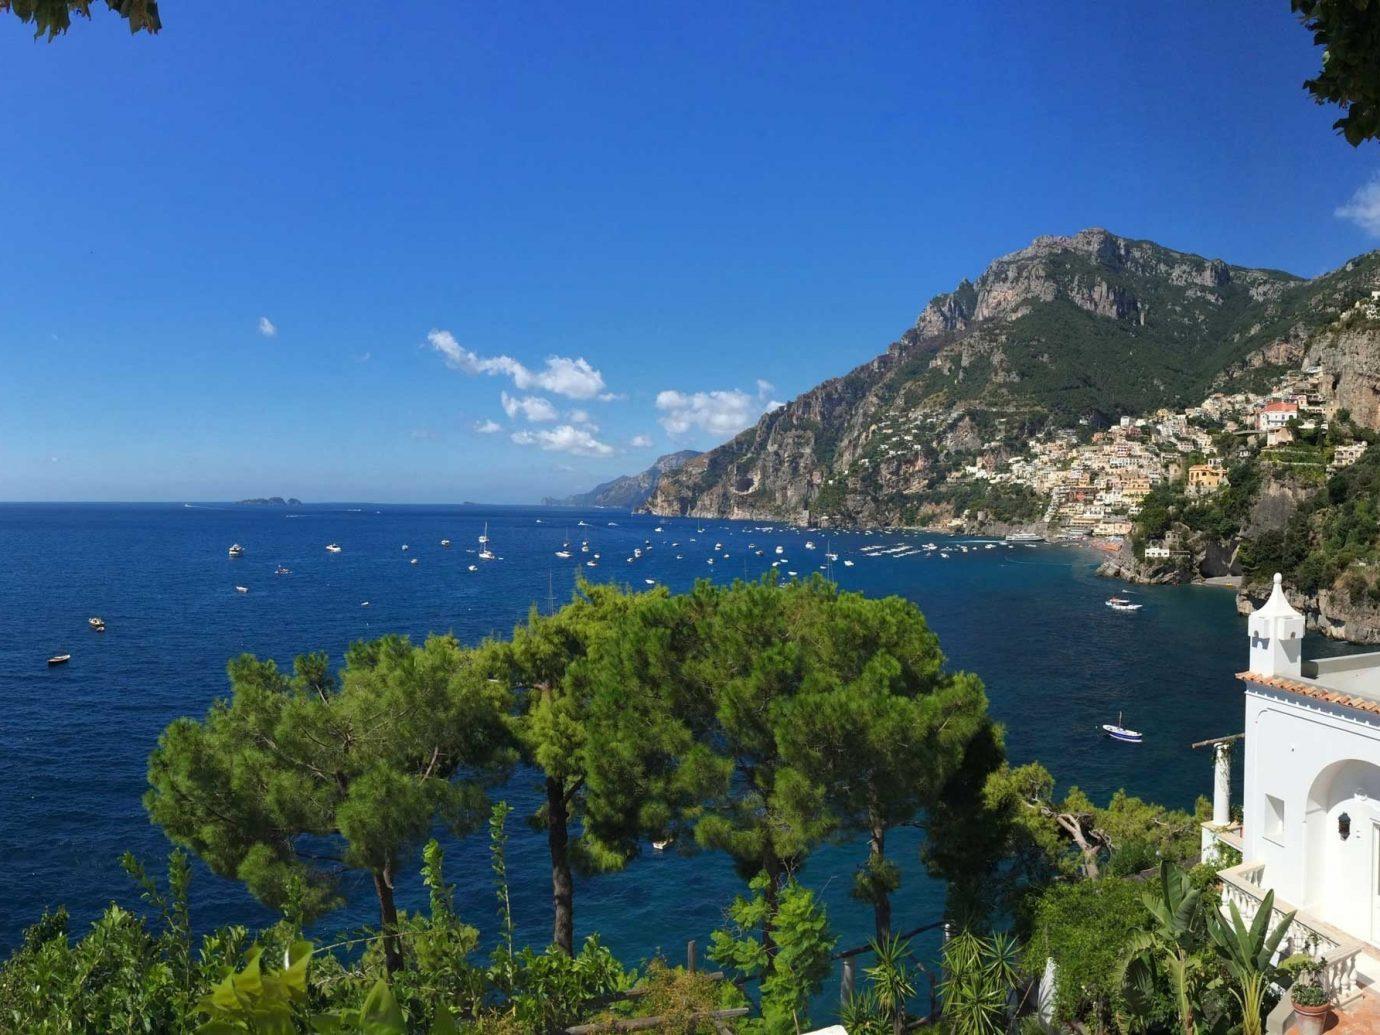 View of the ocean from Villa Tre Ville, Positano